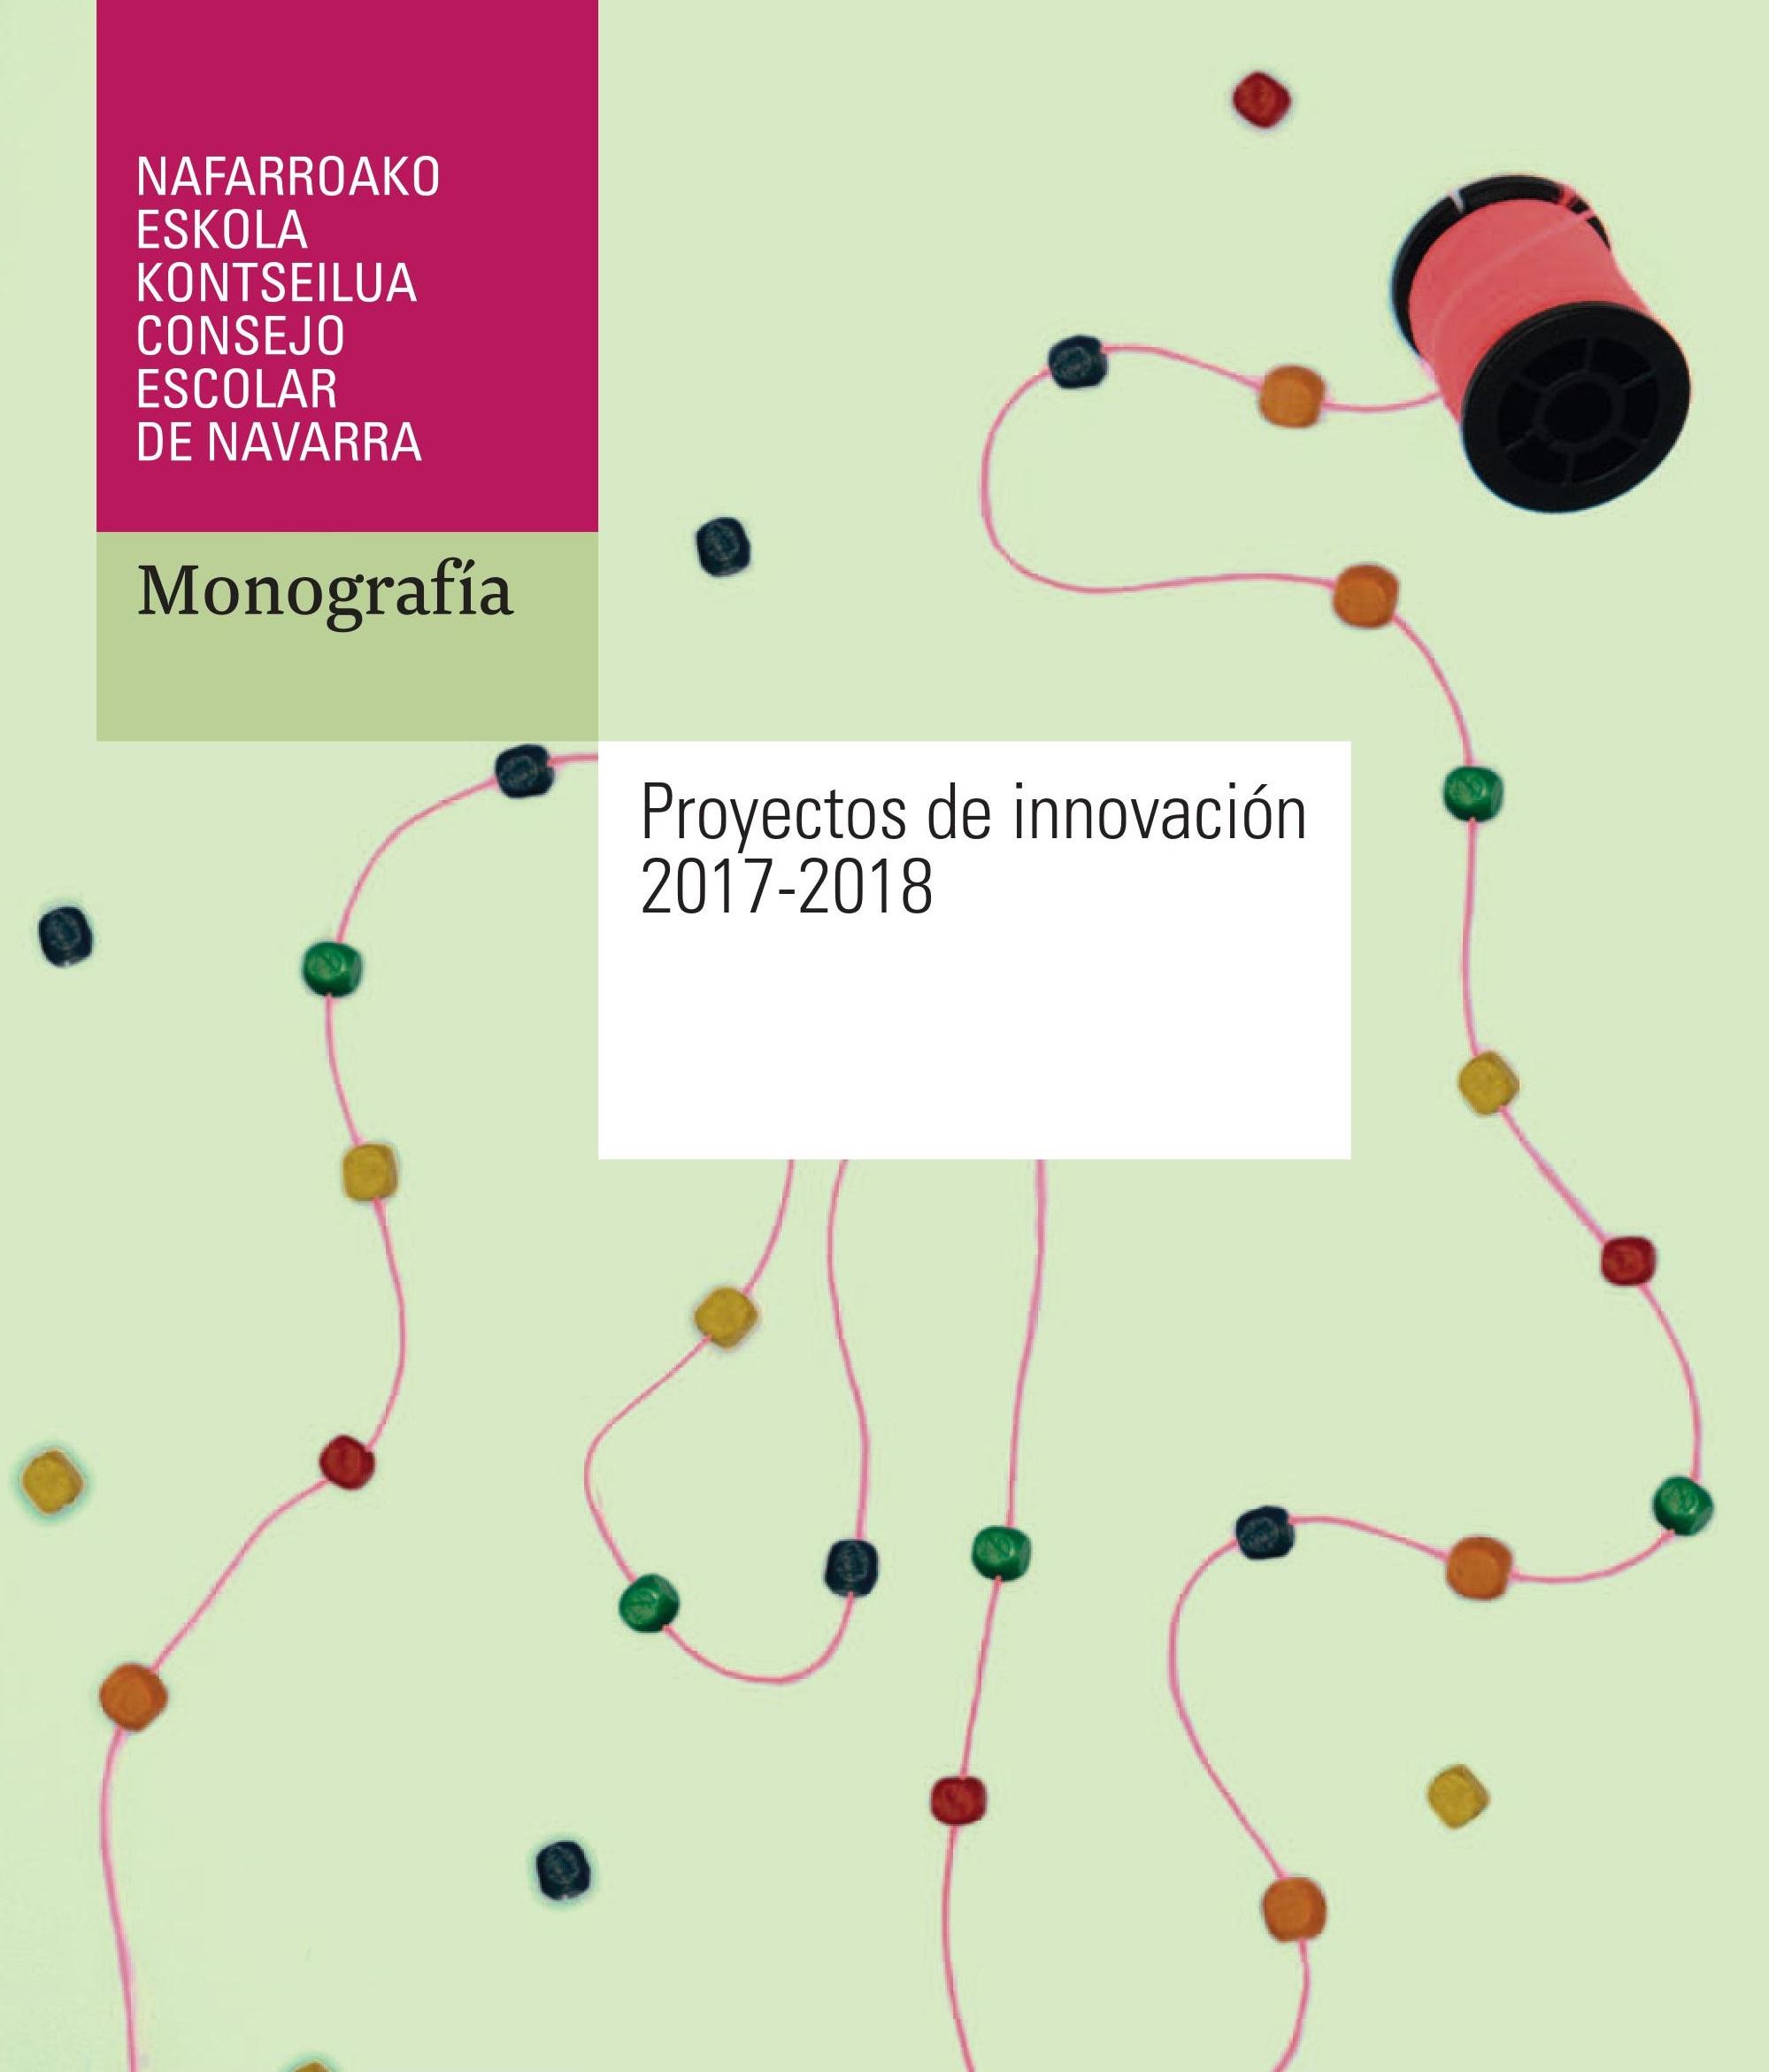 Proyectos de innovación 2017-2018